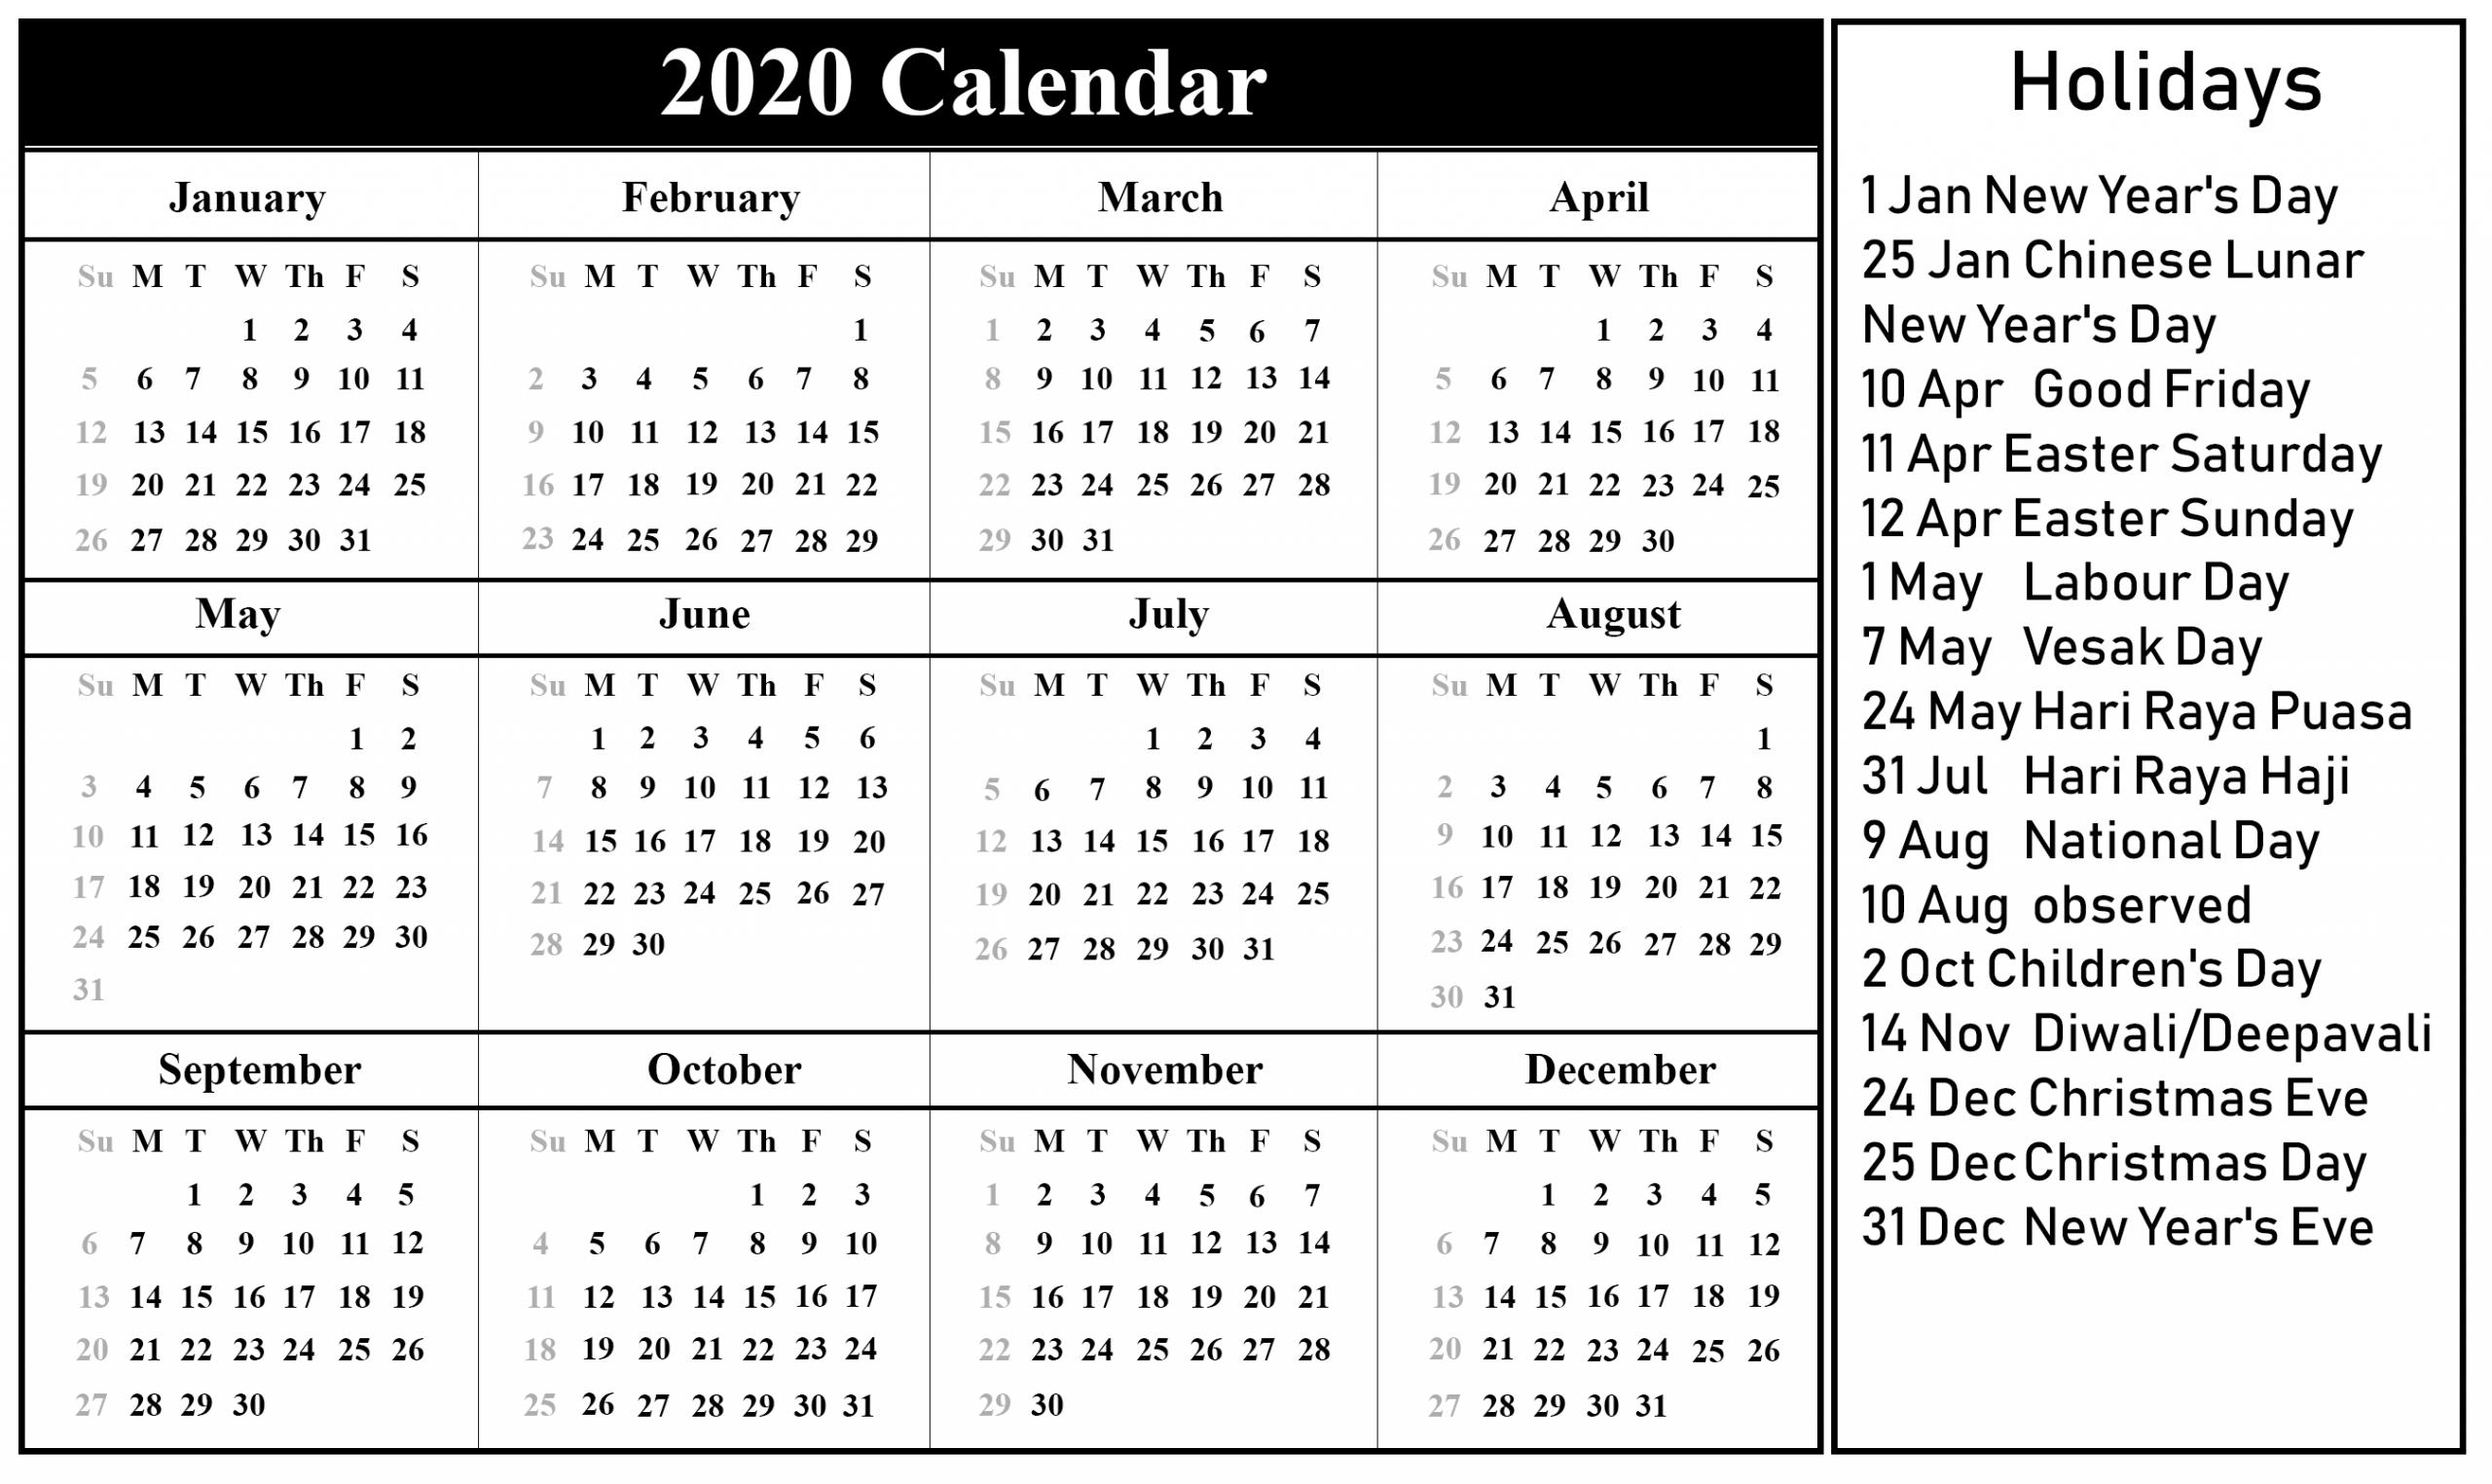 Get Free Printable Holiday Calendars